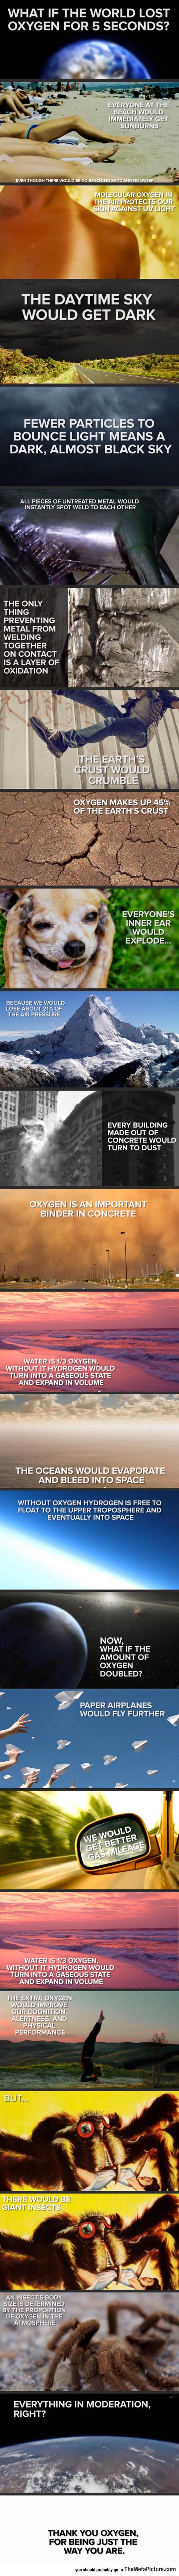 funny-oxygen-world-spider